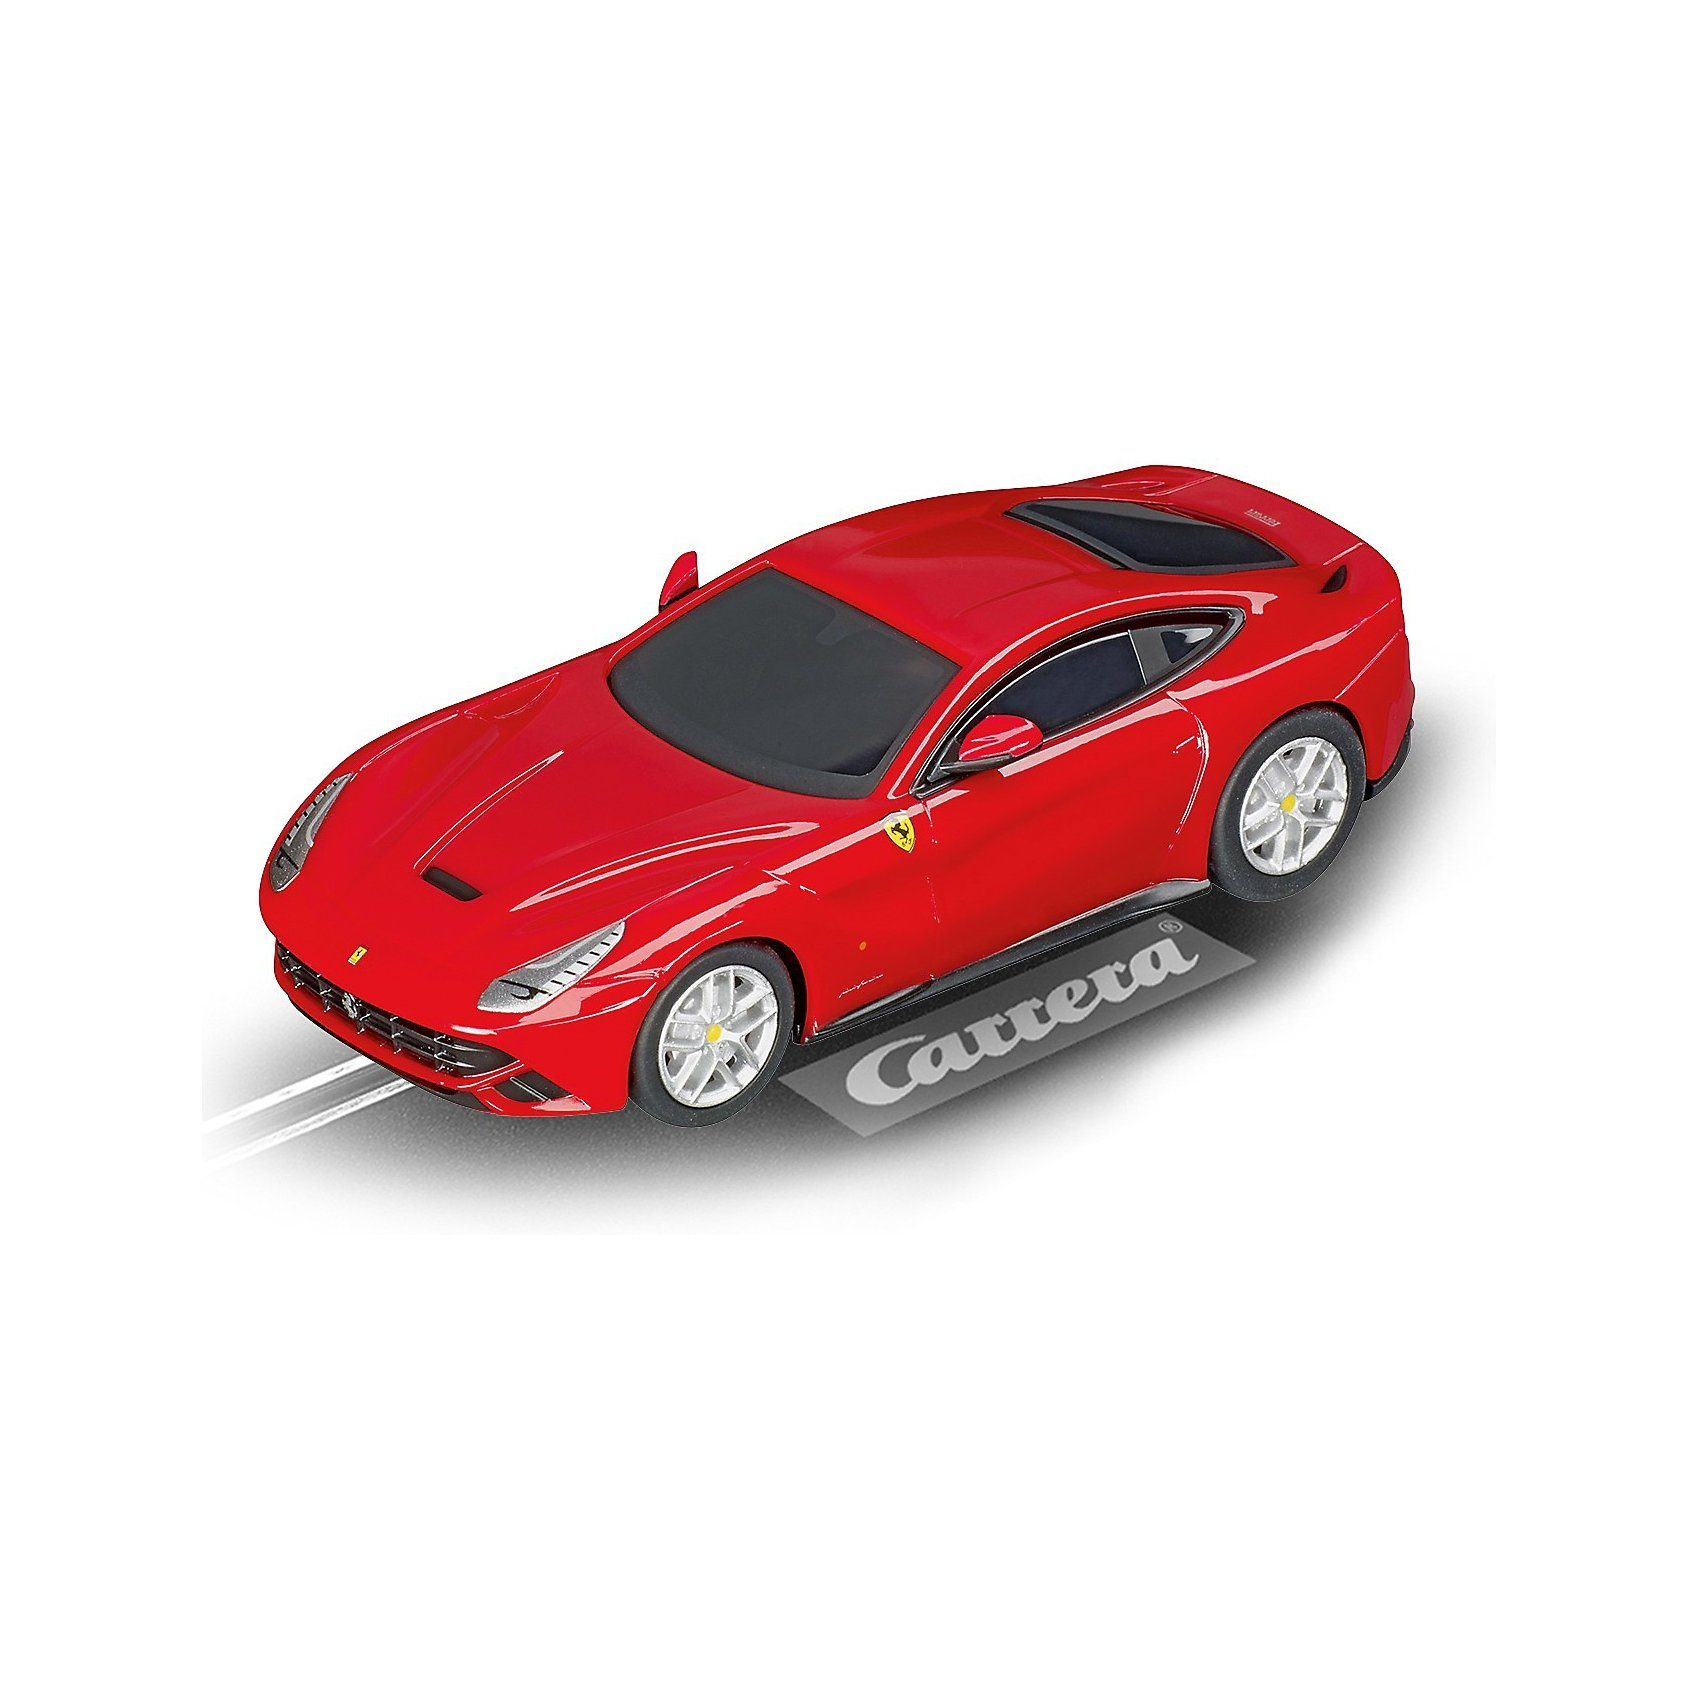 Carrera GO!!! 61276 Ferrari F12 Berlinetta